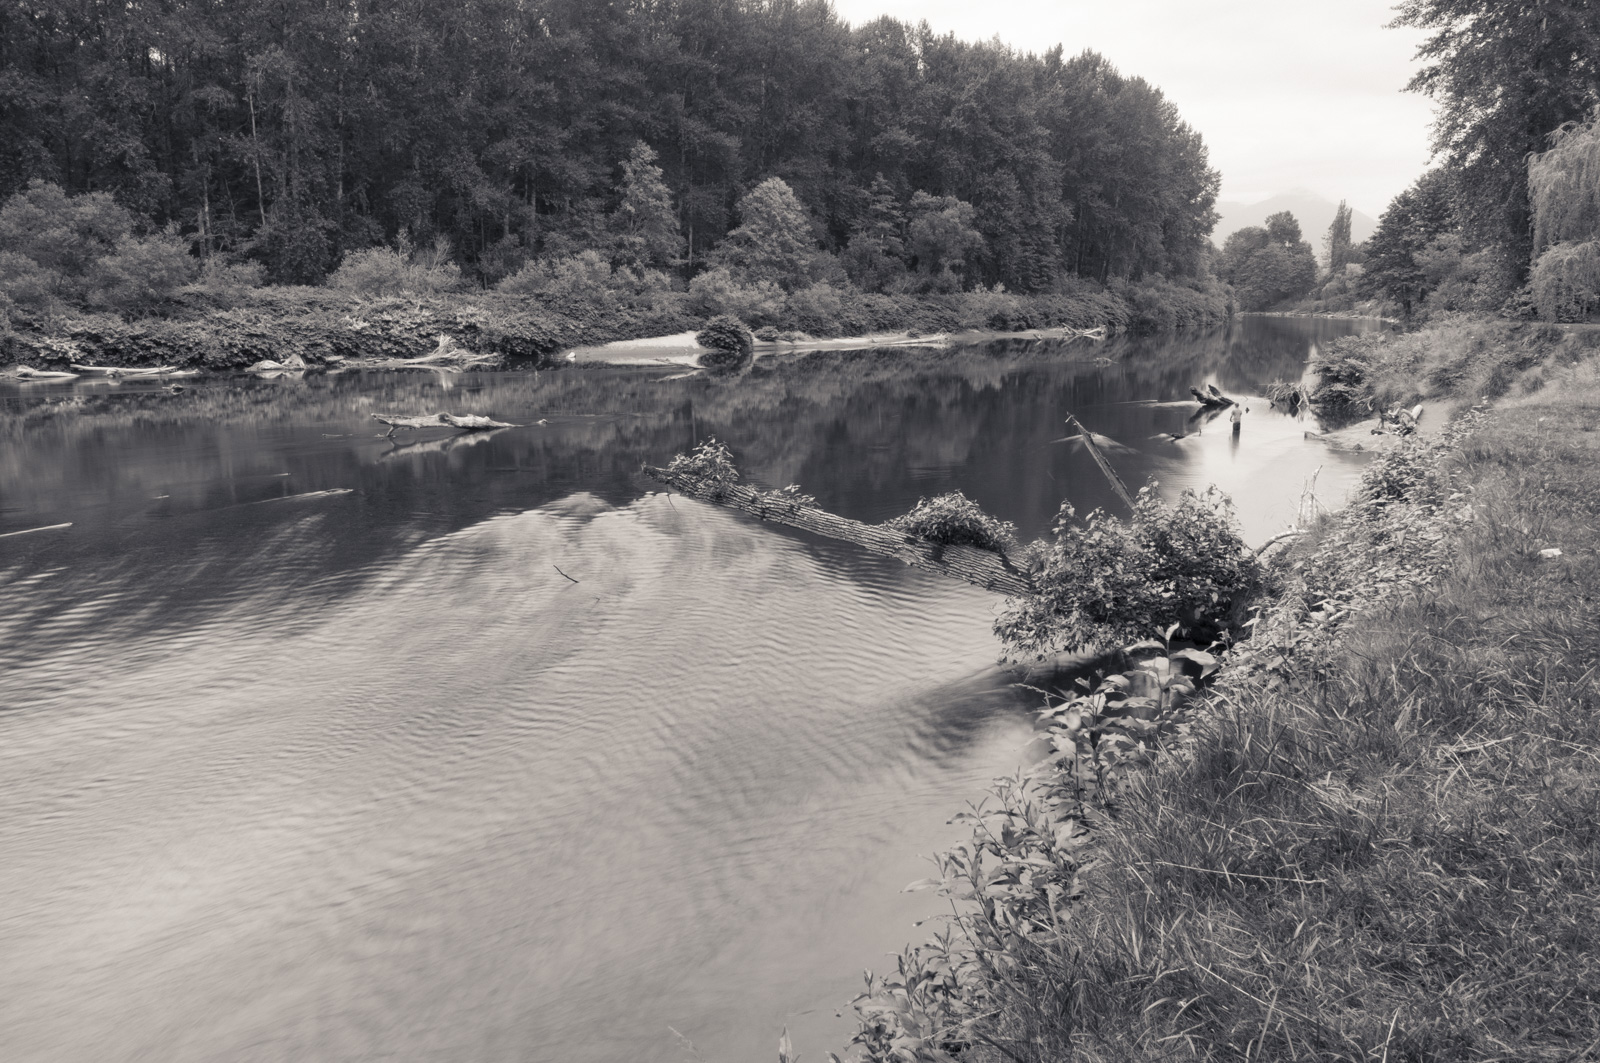 Snoqualmie River, Snoqualmie, Washington 2016